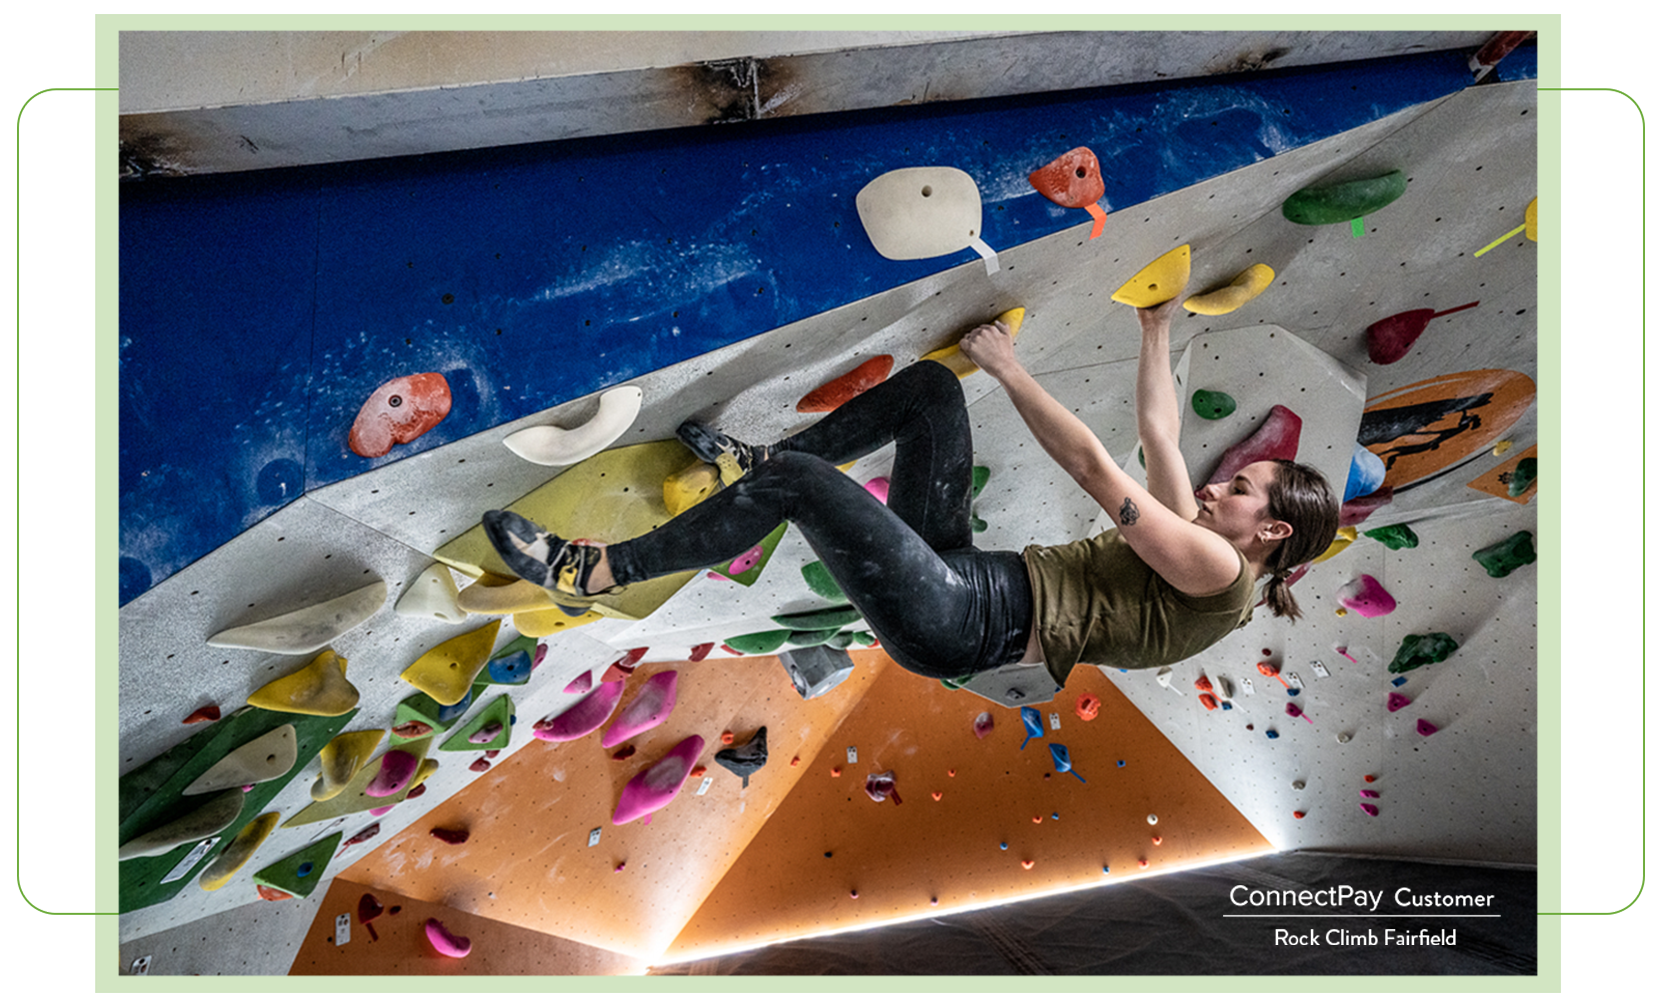 Rock Climb.jpg-1